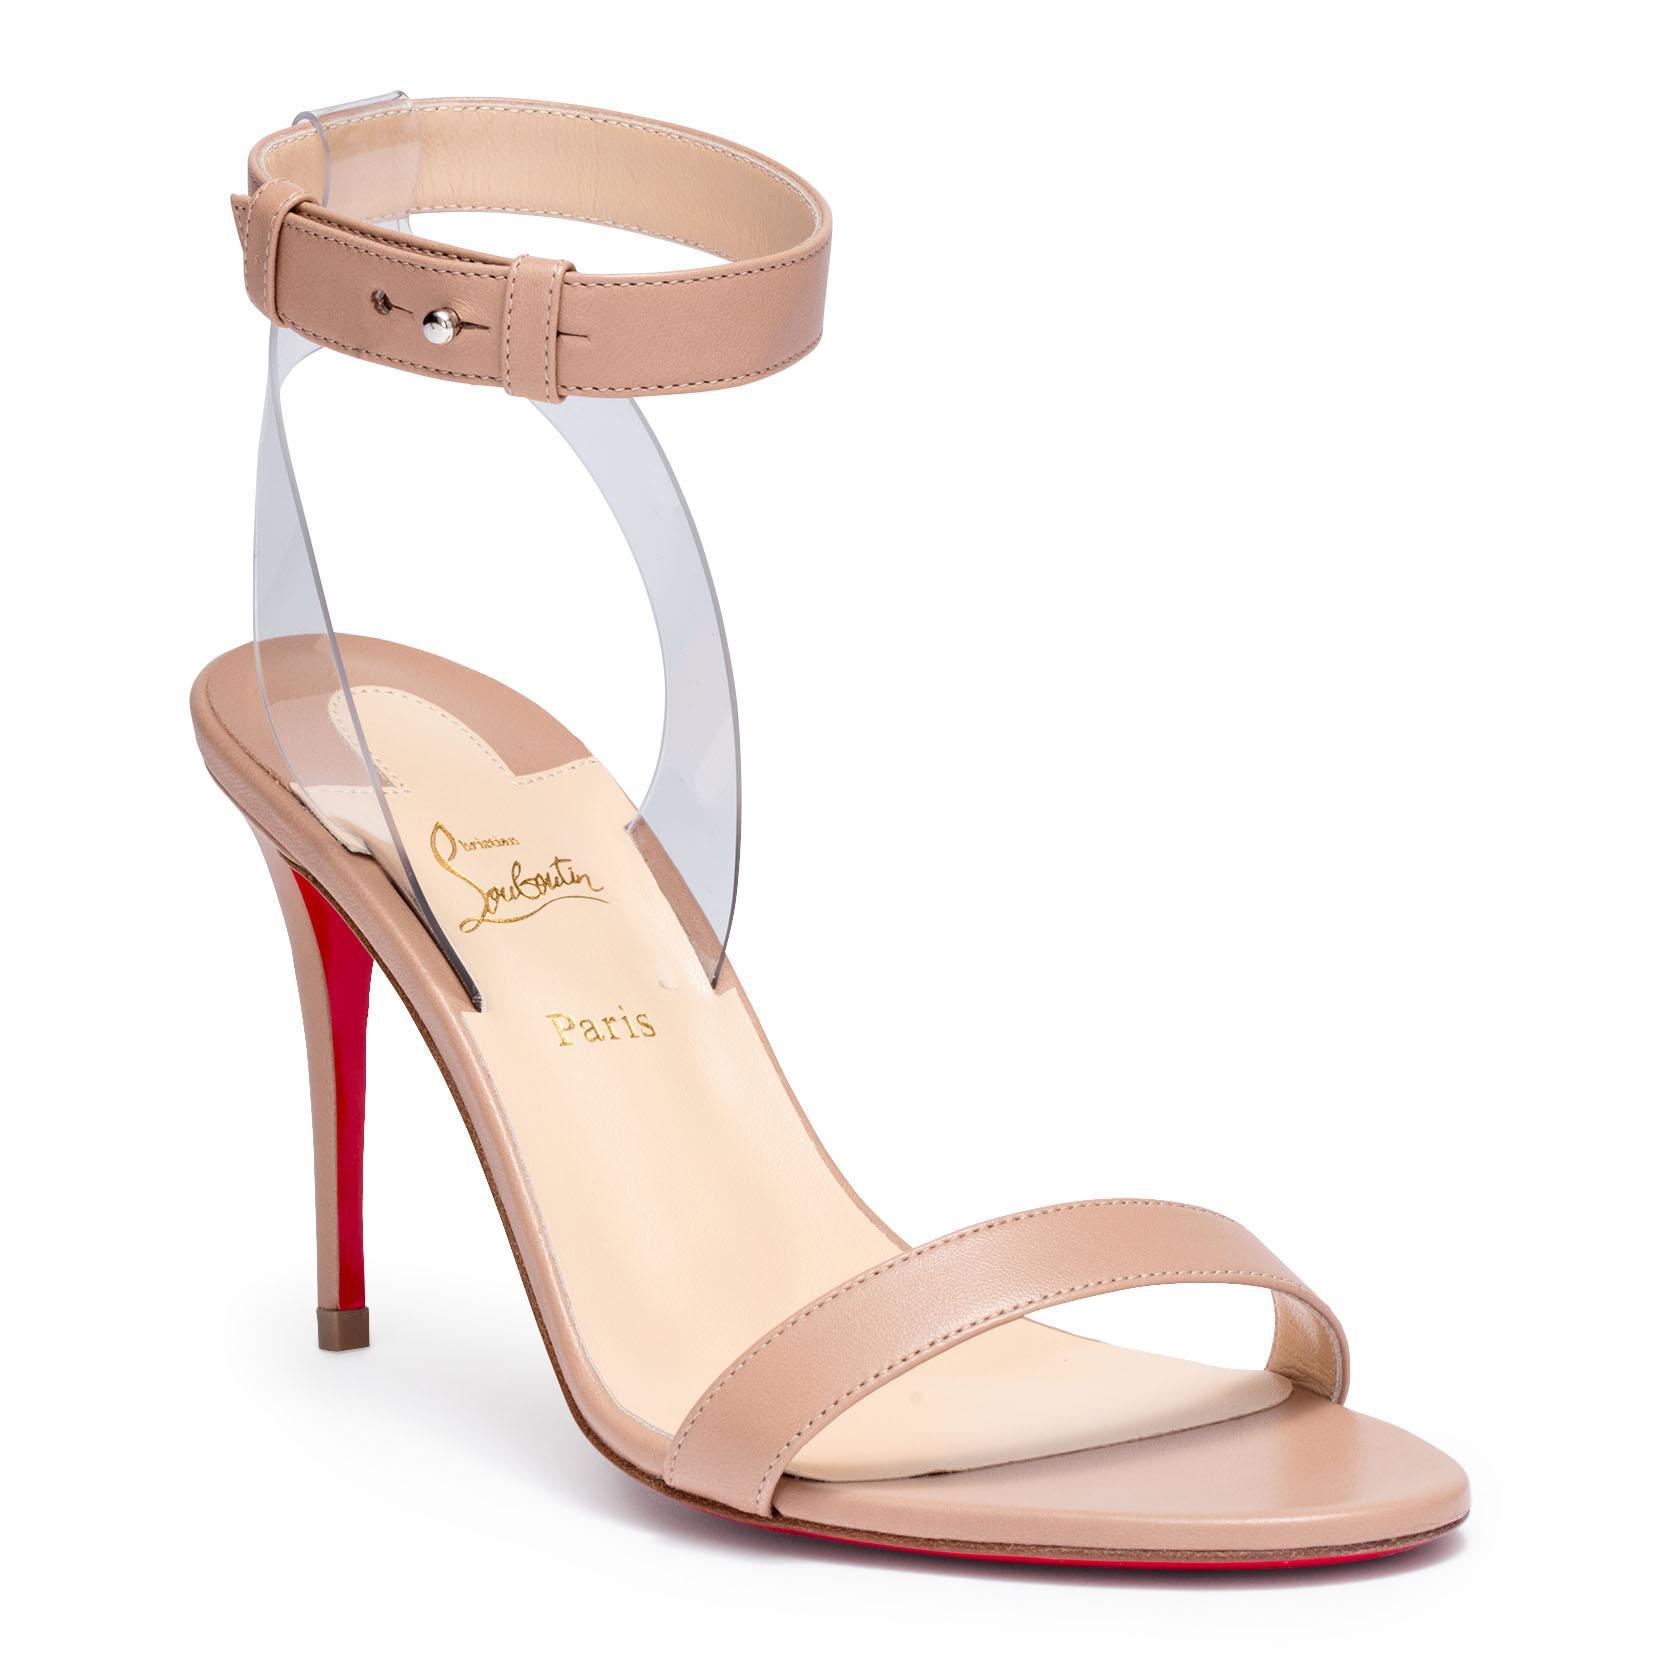 4fc61d0ed christian-louboutin--Jonatina-85-Beige-Leather-Sandals.jpeg